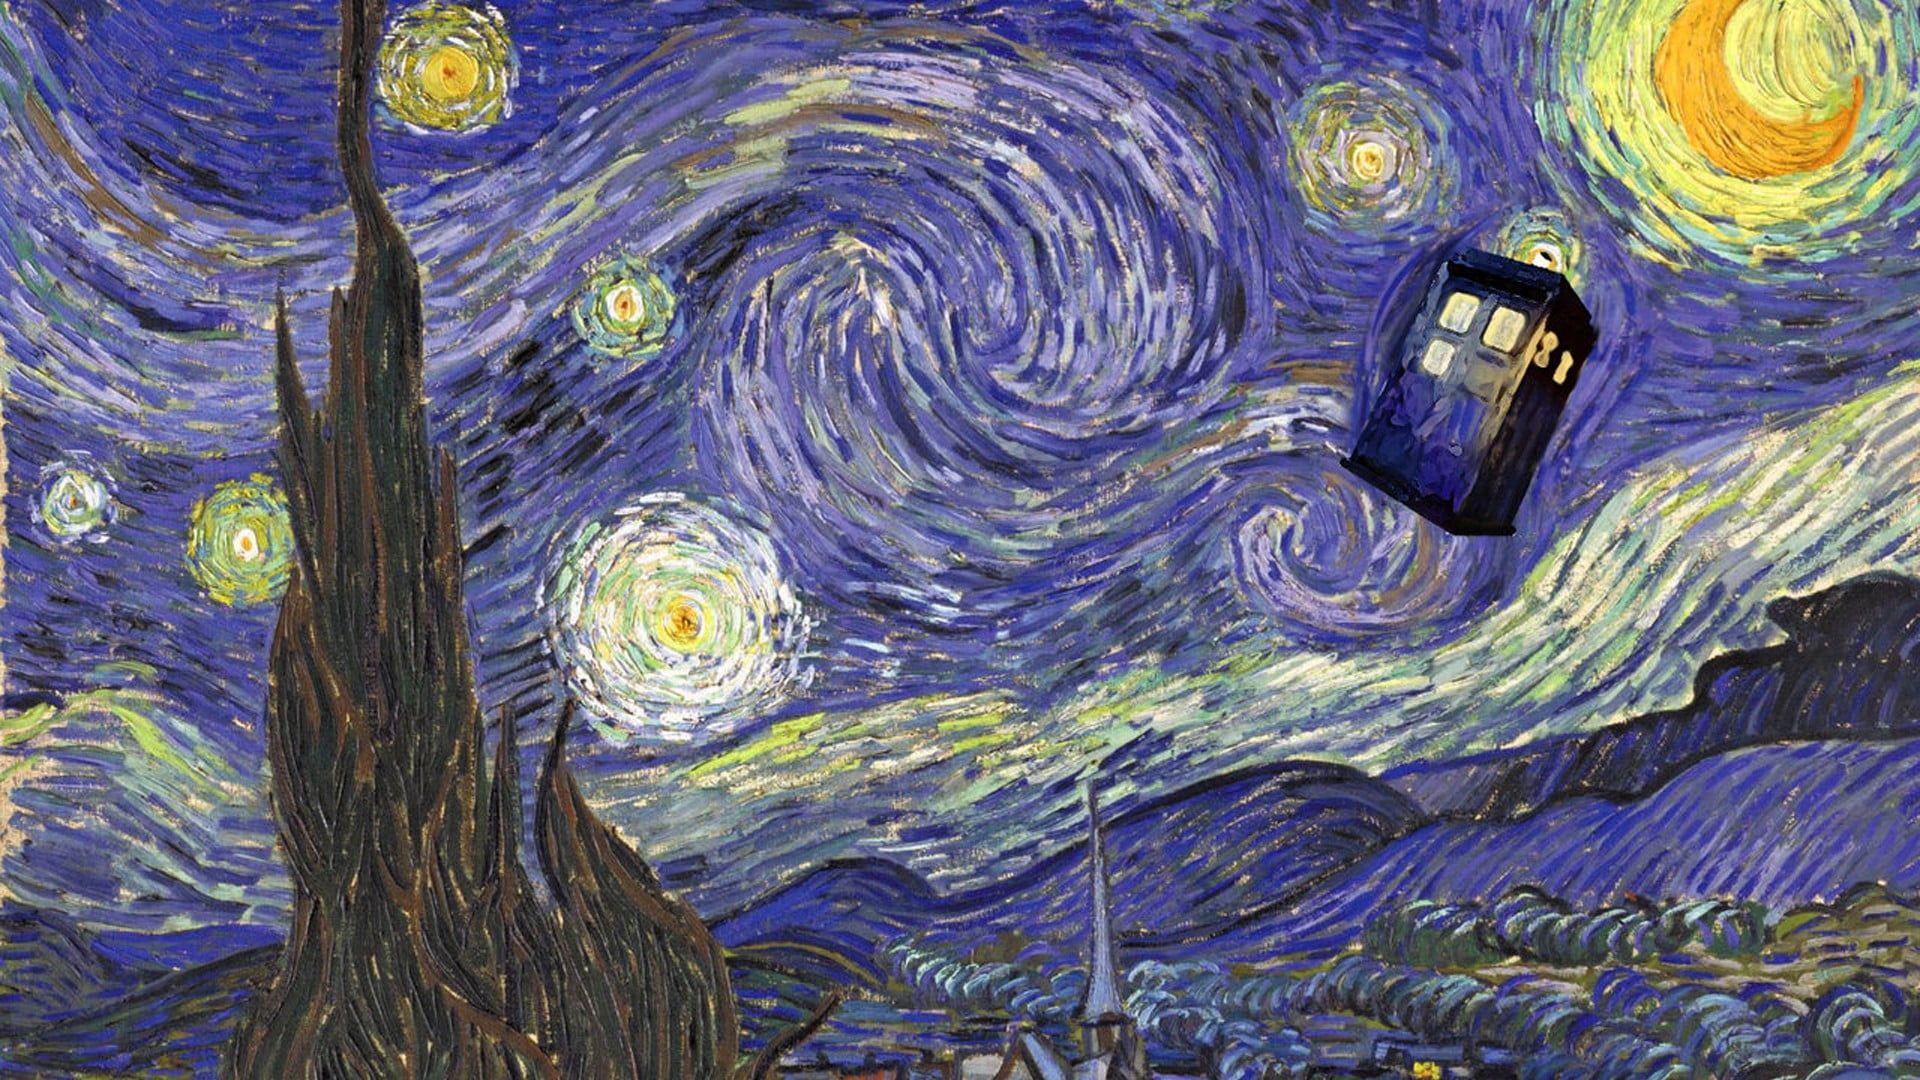 Starry Night By Vincent Van Gogh Doctor Who Tardis 1080p Wallpaper Hdwallpaper Desktop Van Gogh Vincent Van Gogh Tardis Van Gogh